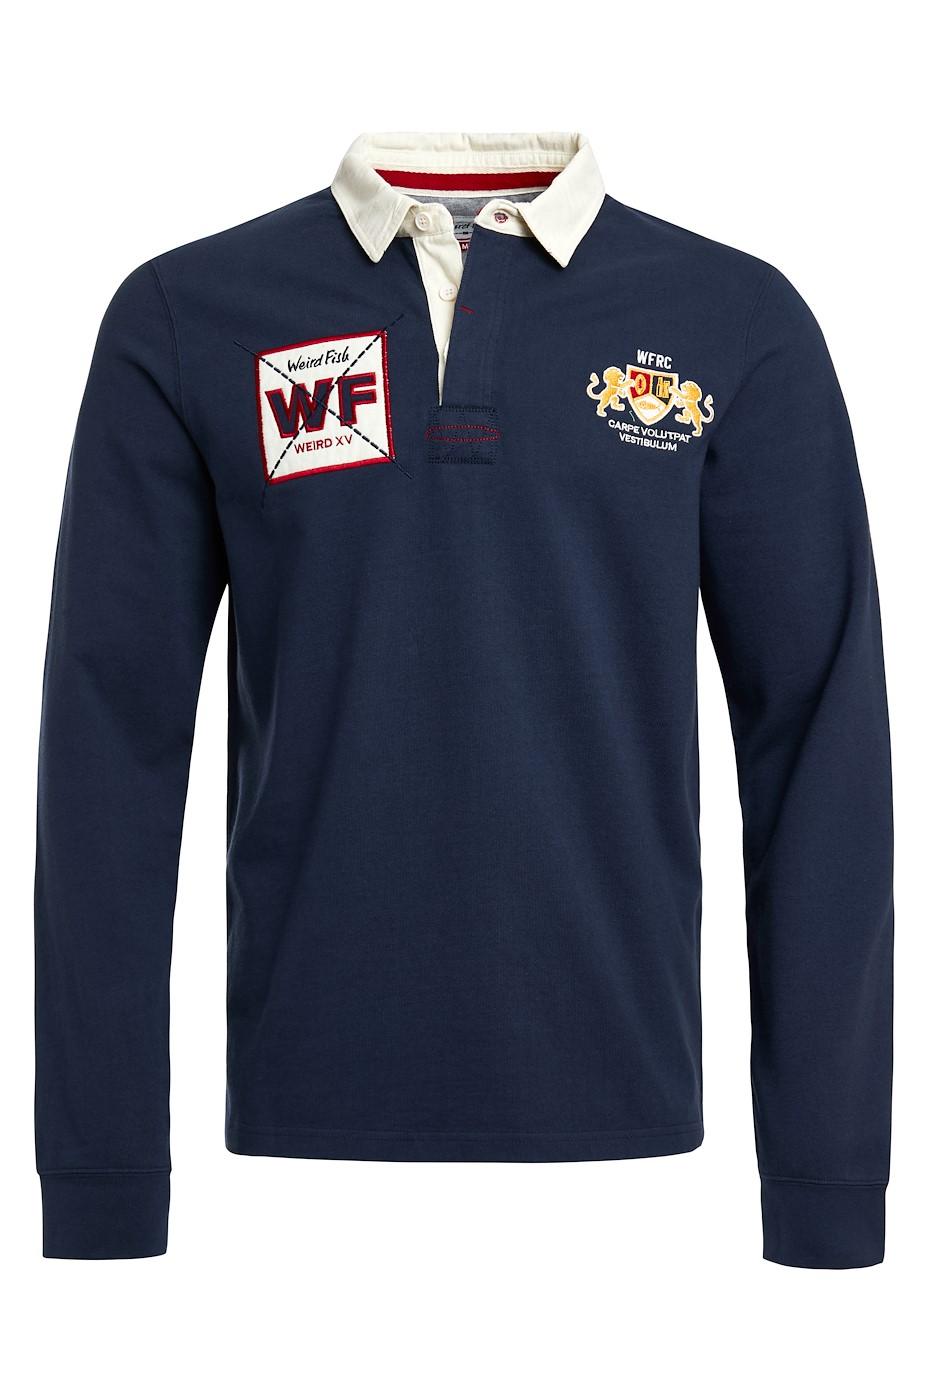 Higton Organic Long Sleeve Plain Rugby Shirt Navy